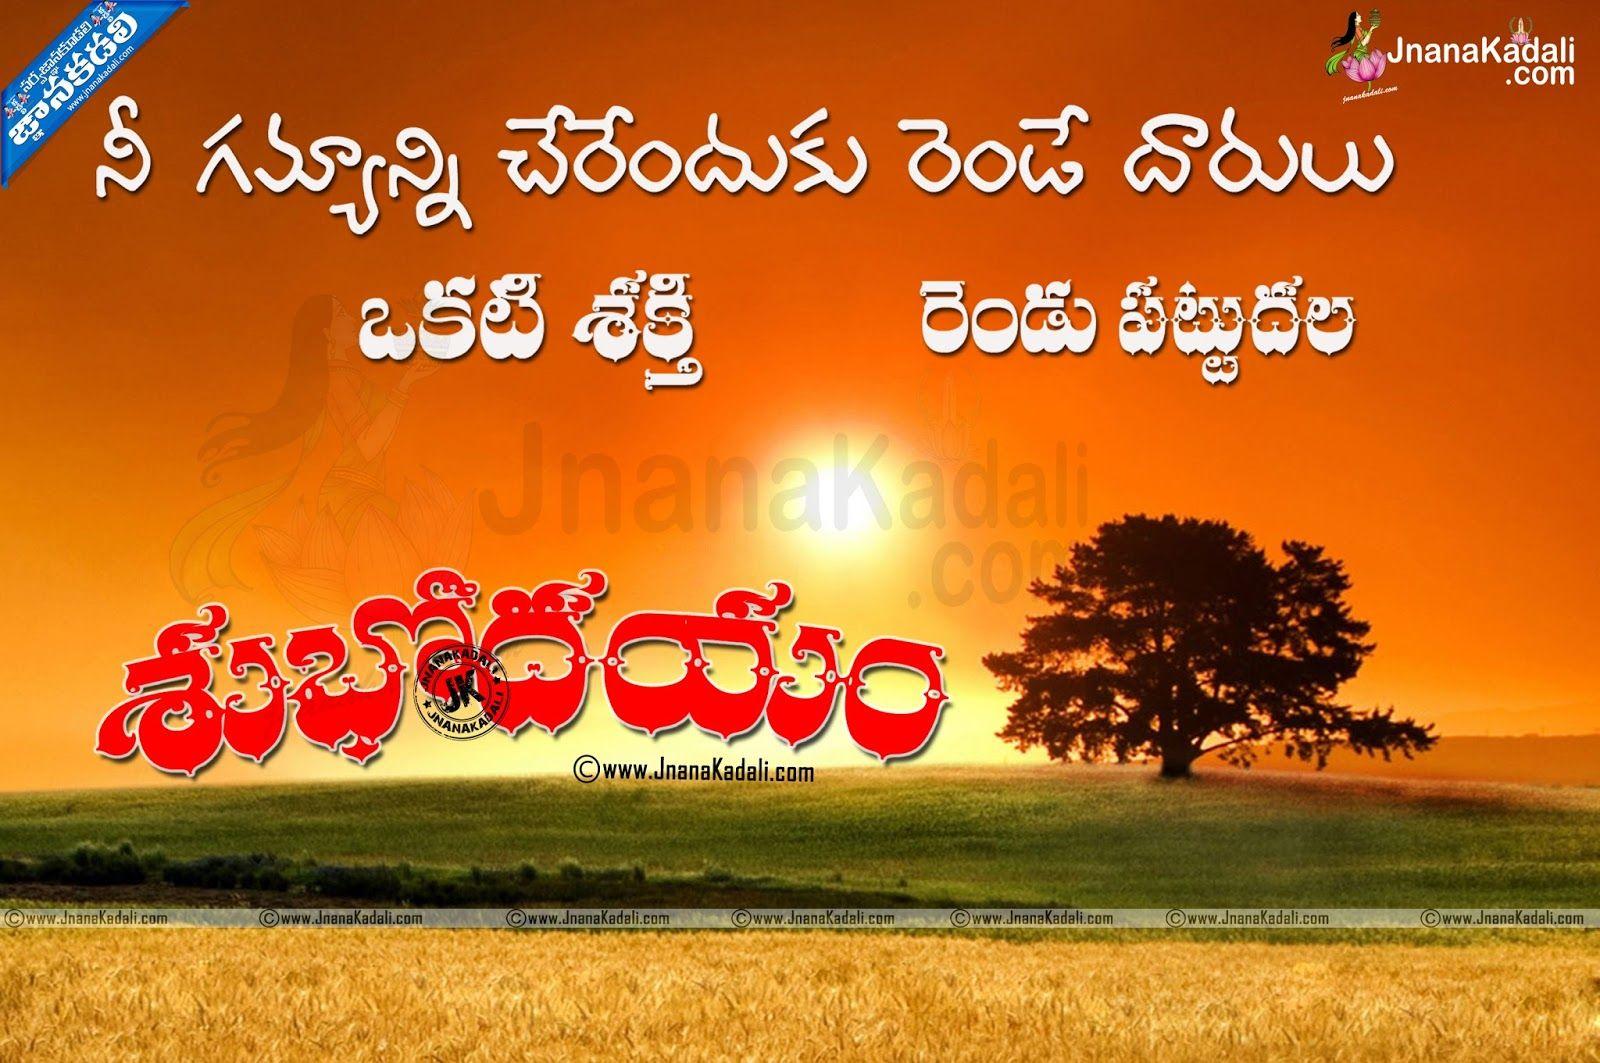 Best inspirational good morning greetings quotes in telugu 88 all best inspirational good morning greetings quotes in telugu 88 m4hsunfo